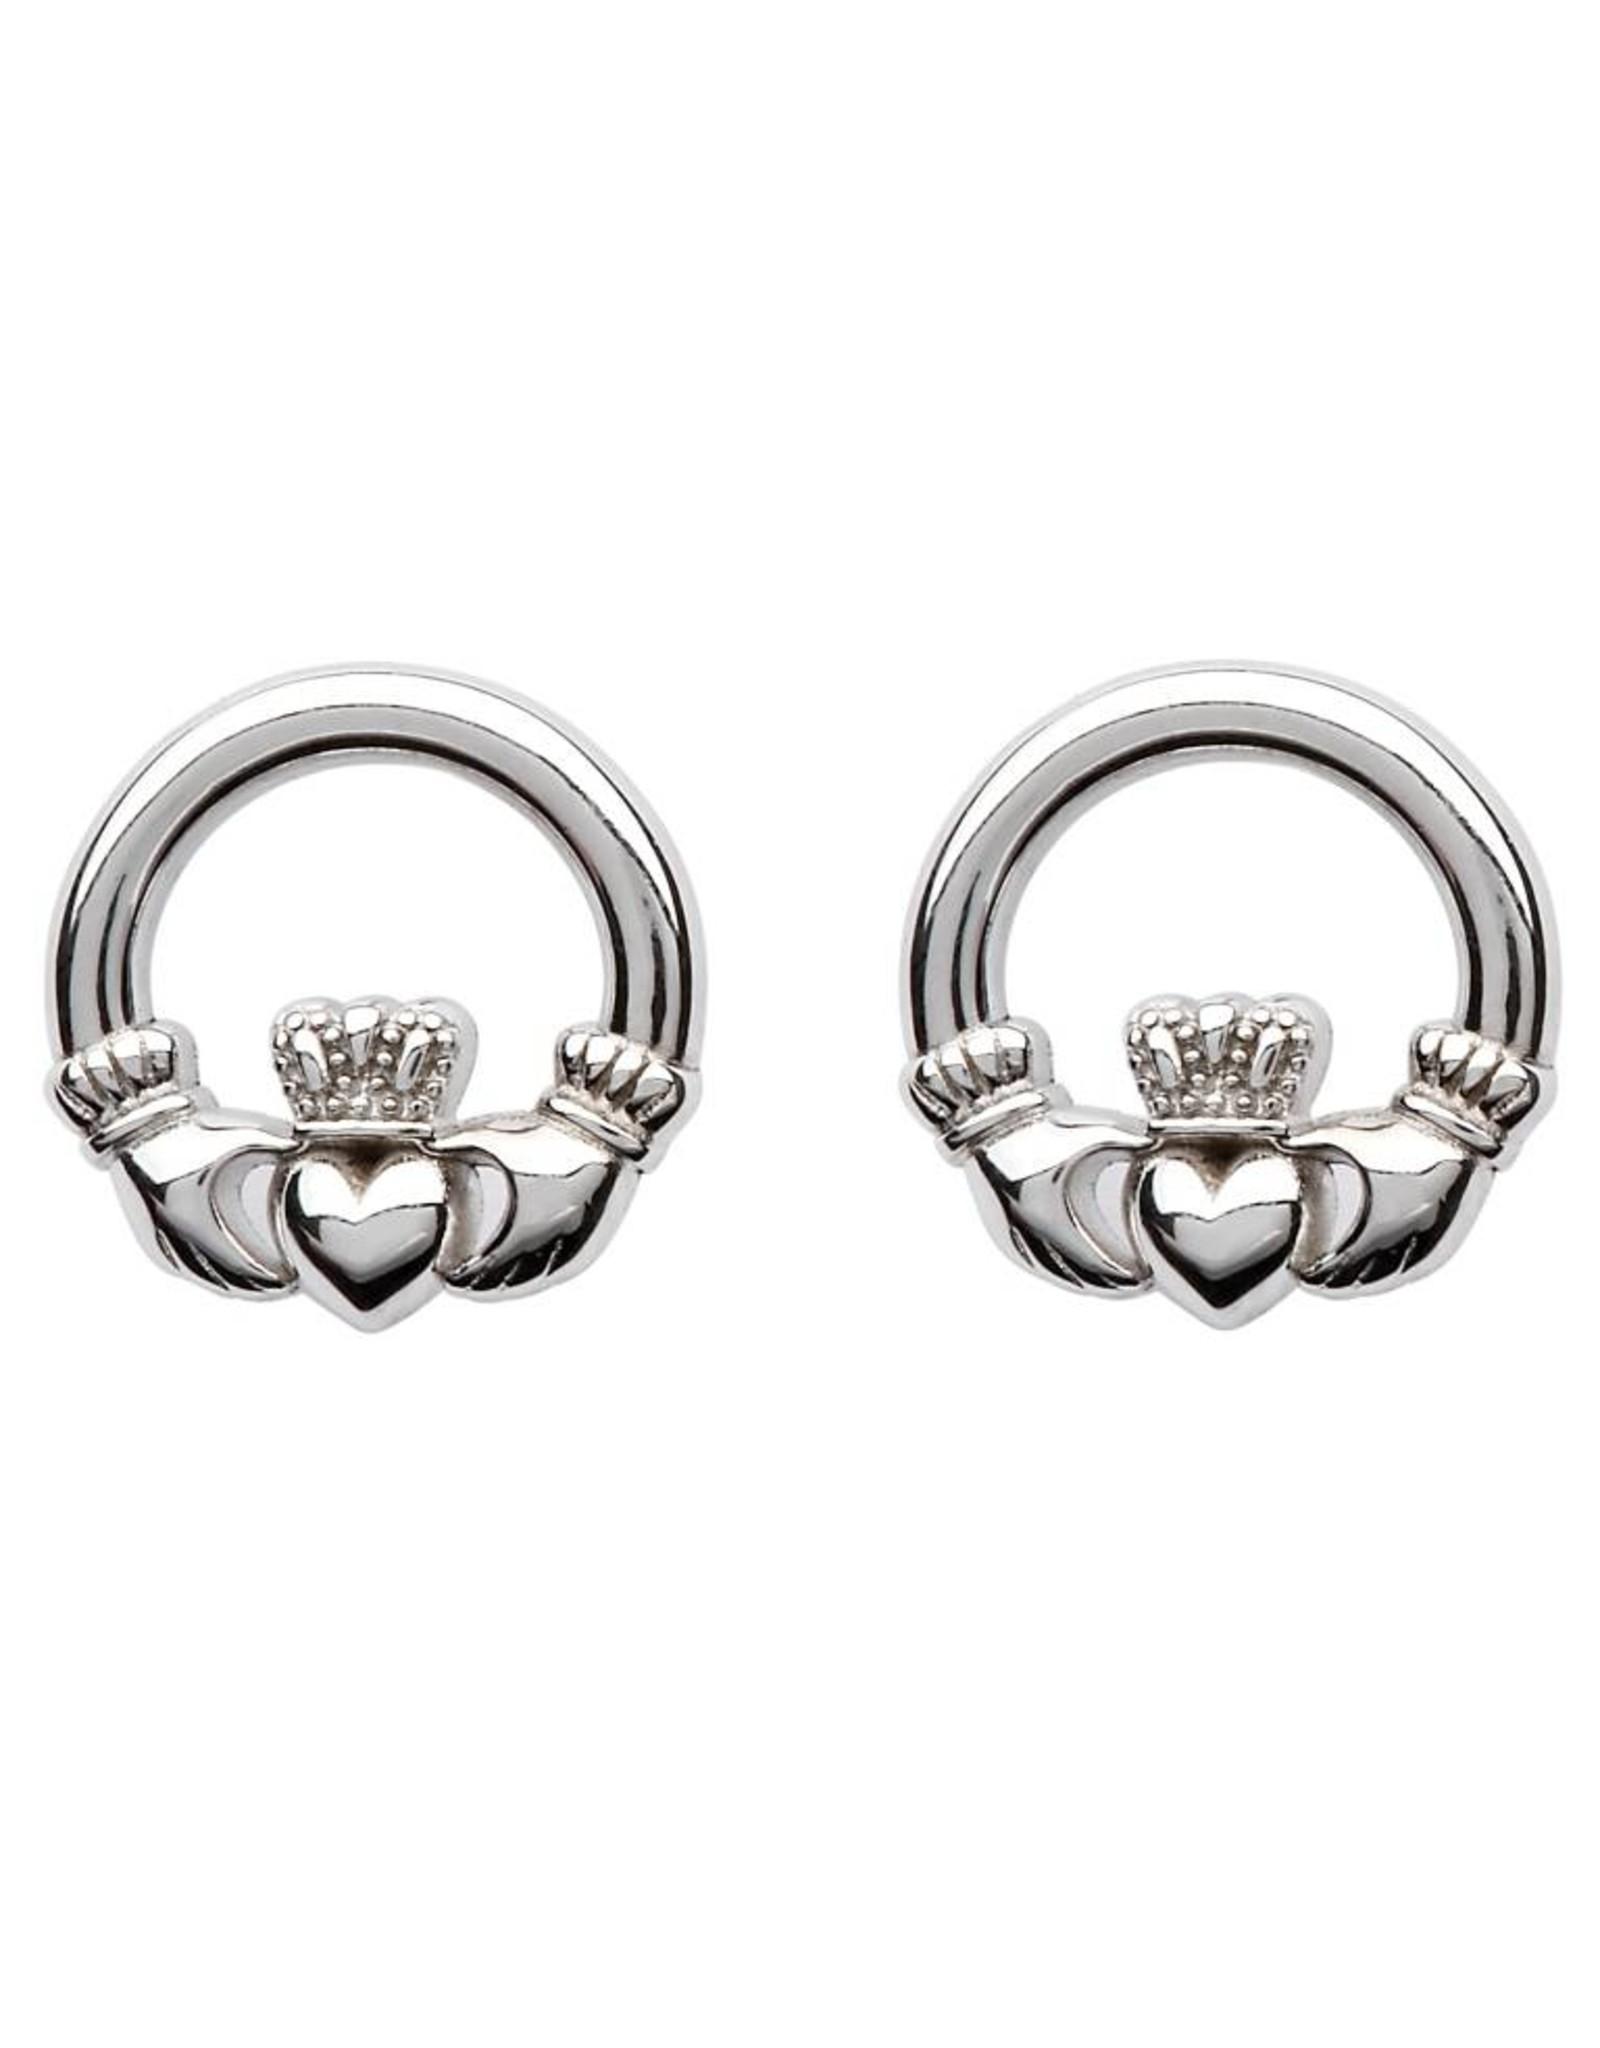 Shanore Sterling Silver Claddagh Stud Earrings